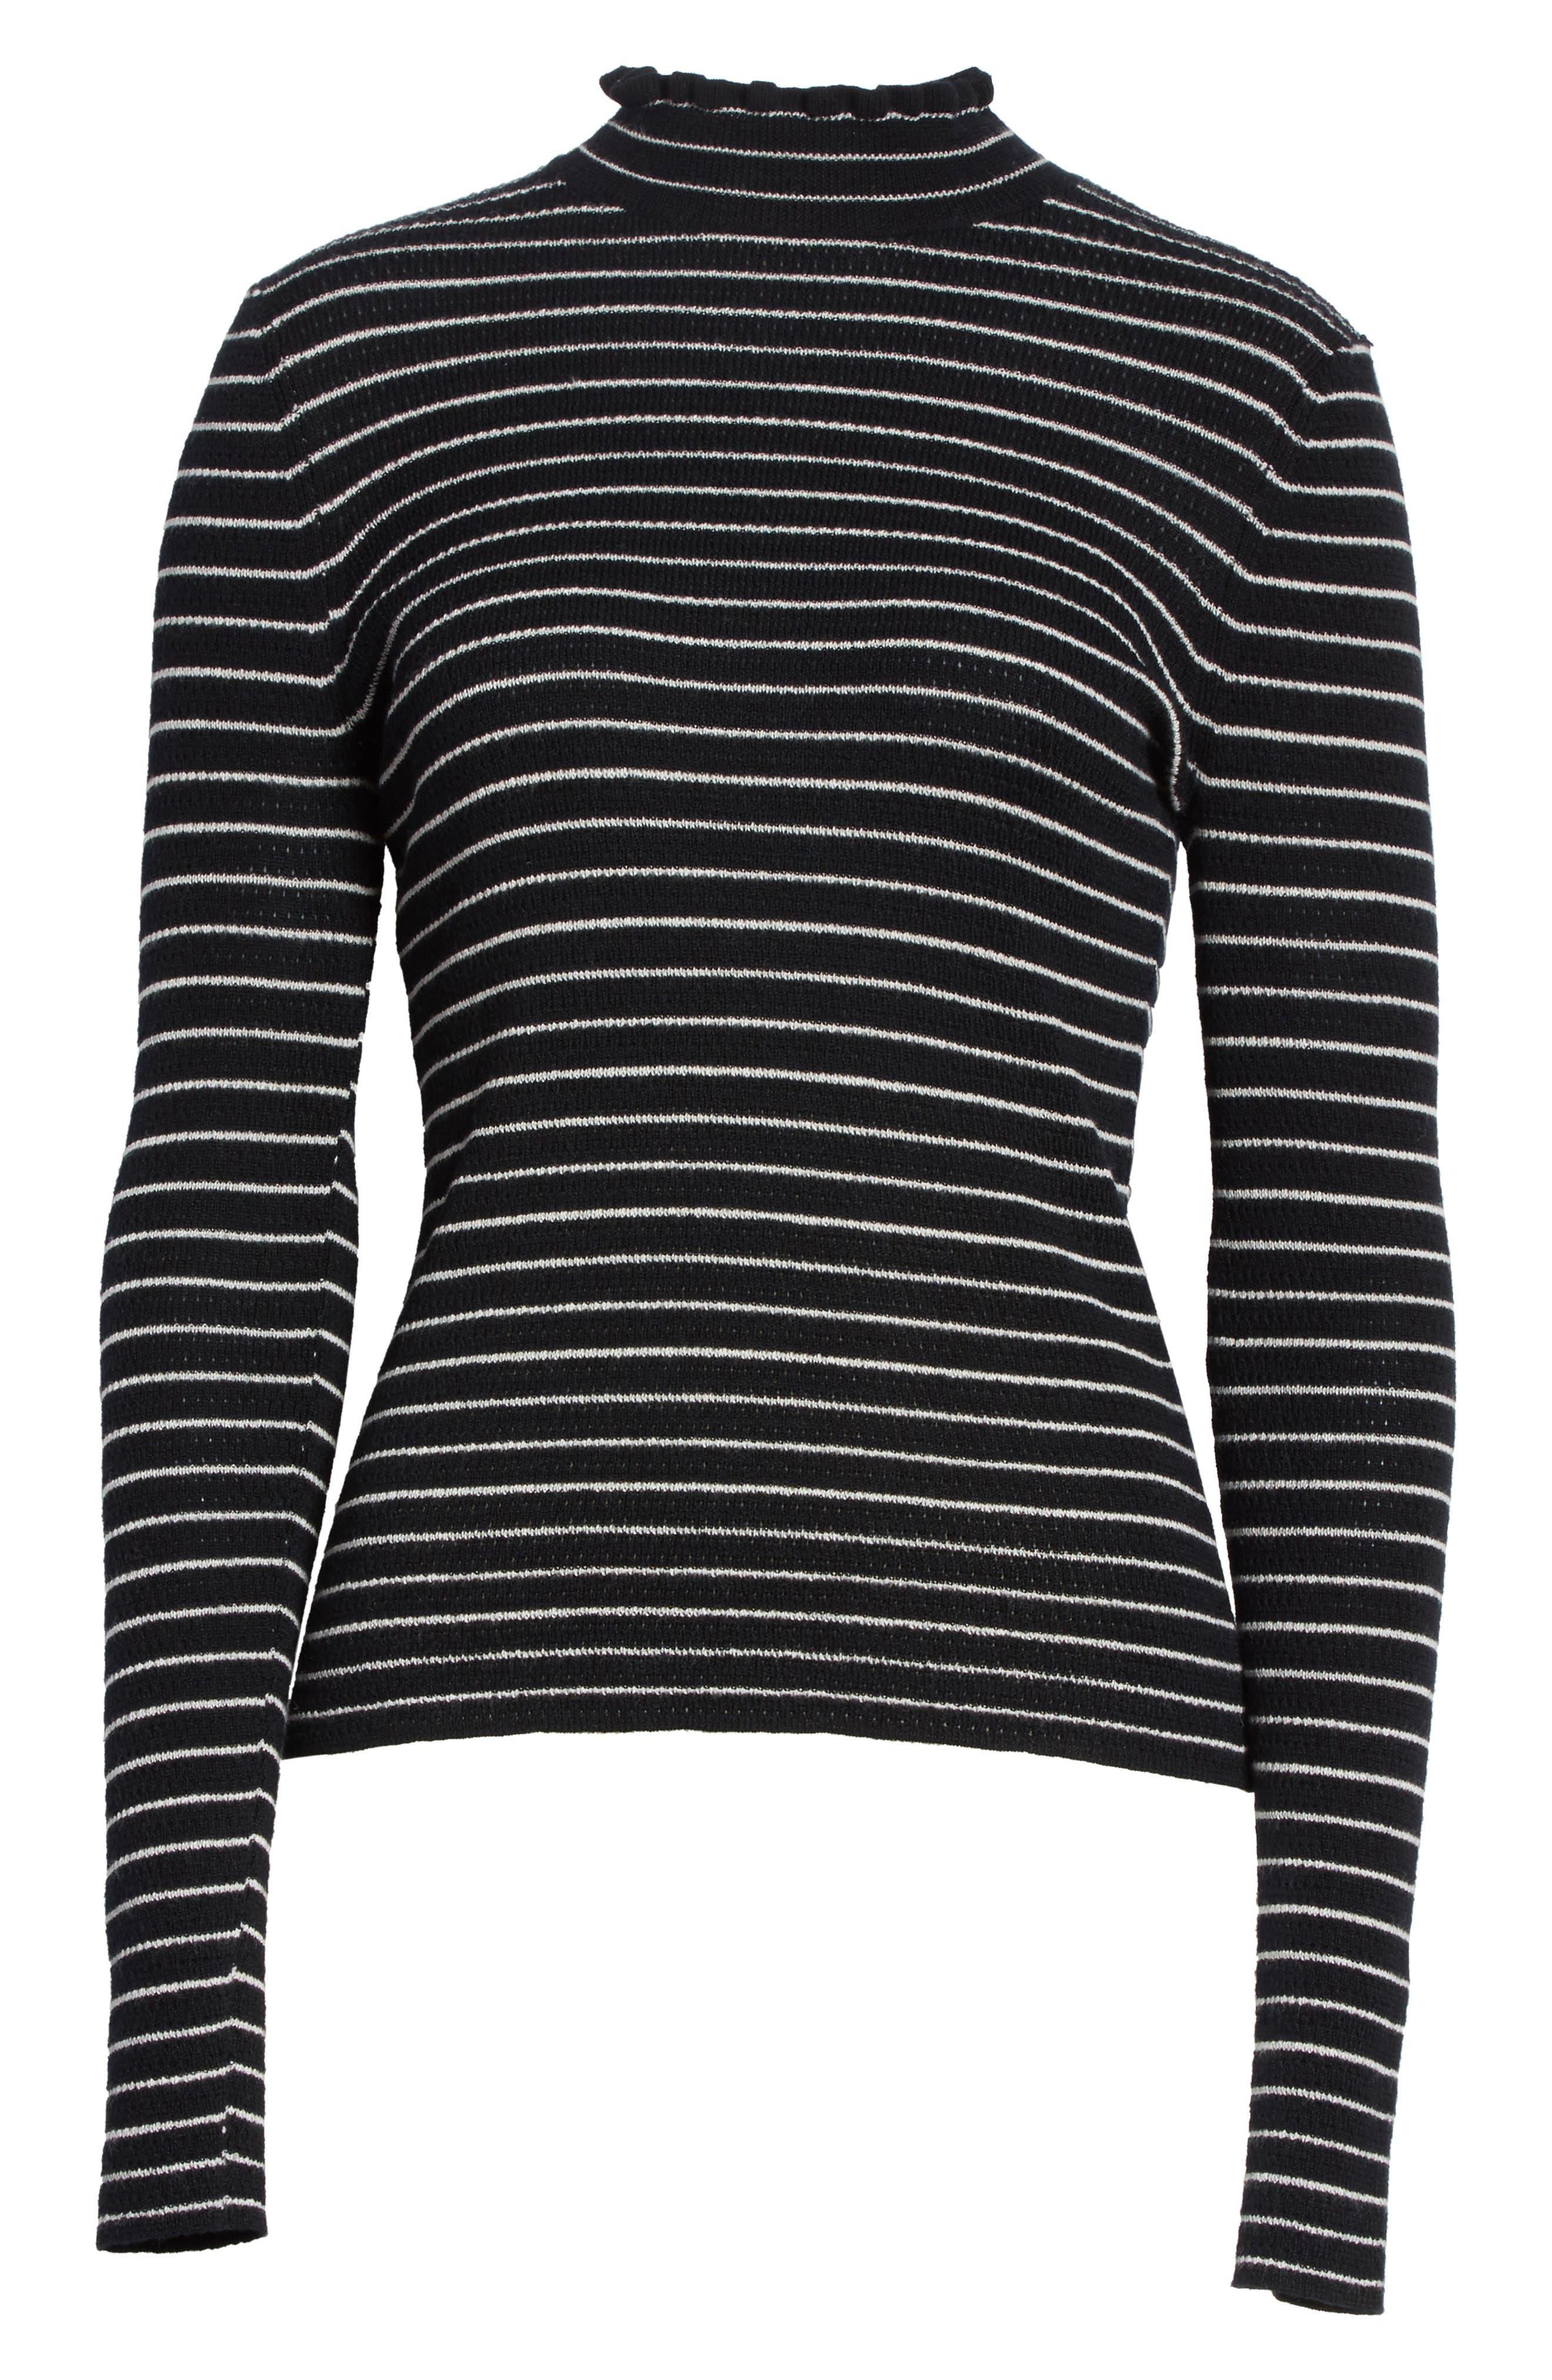 Merino Wool Pullover,                             Alternate thumbnail 6, color,                             002